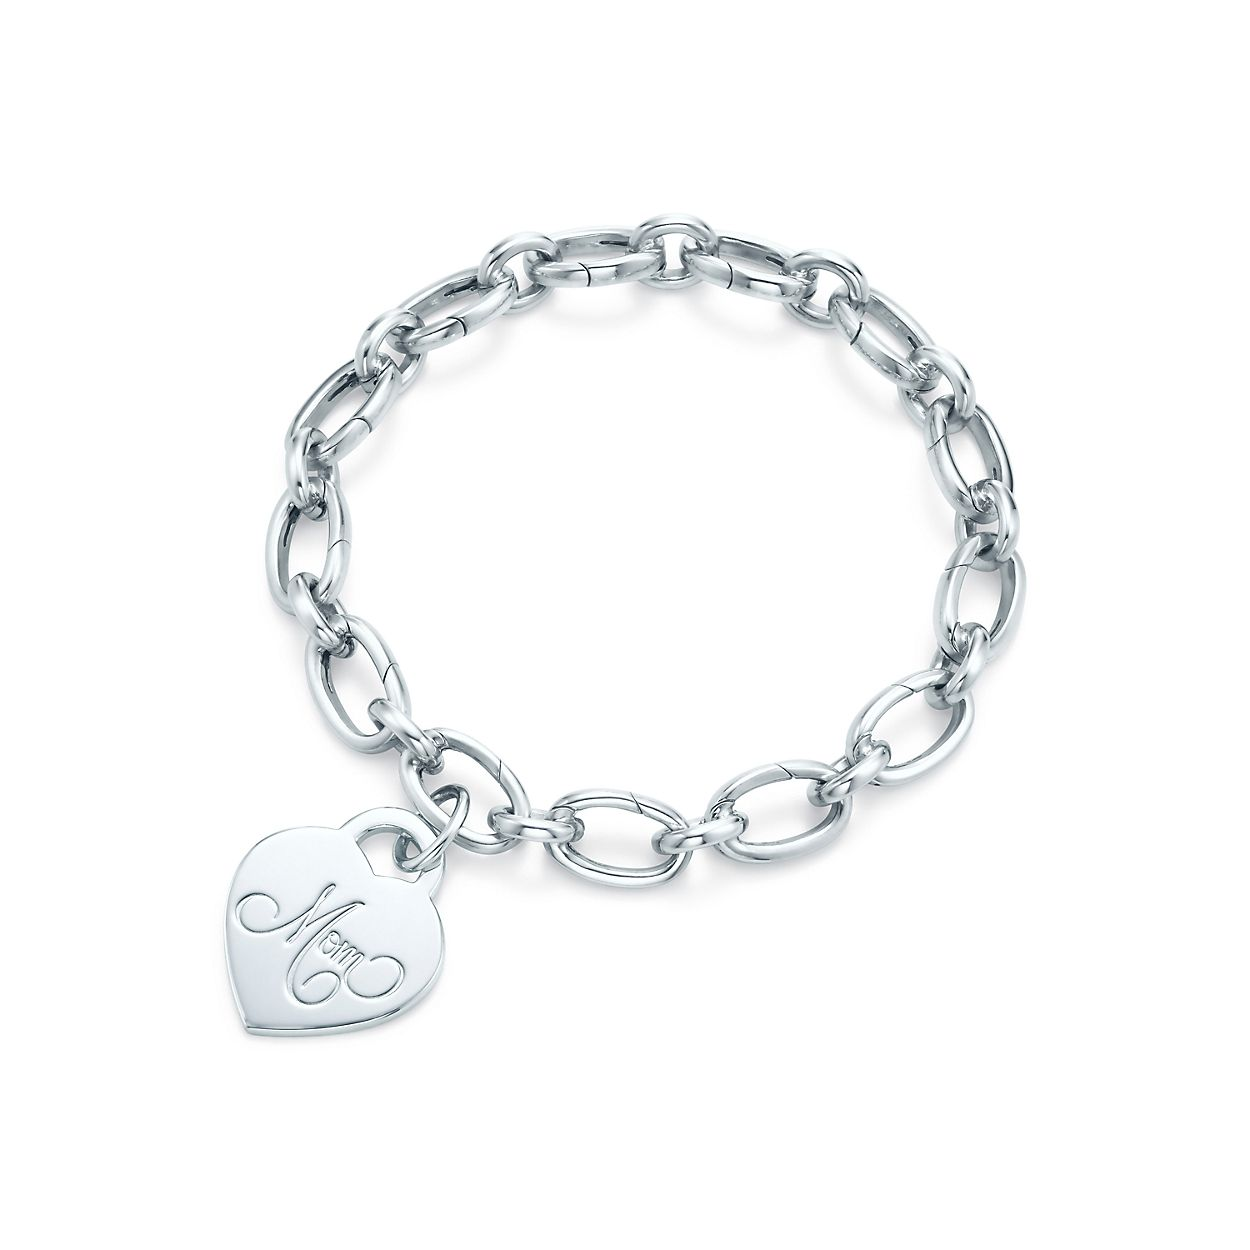 Mom Heart Tag Charm And Bracelet